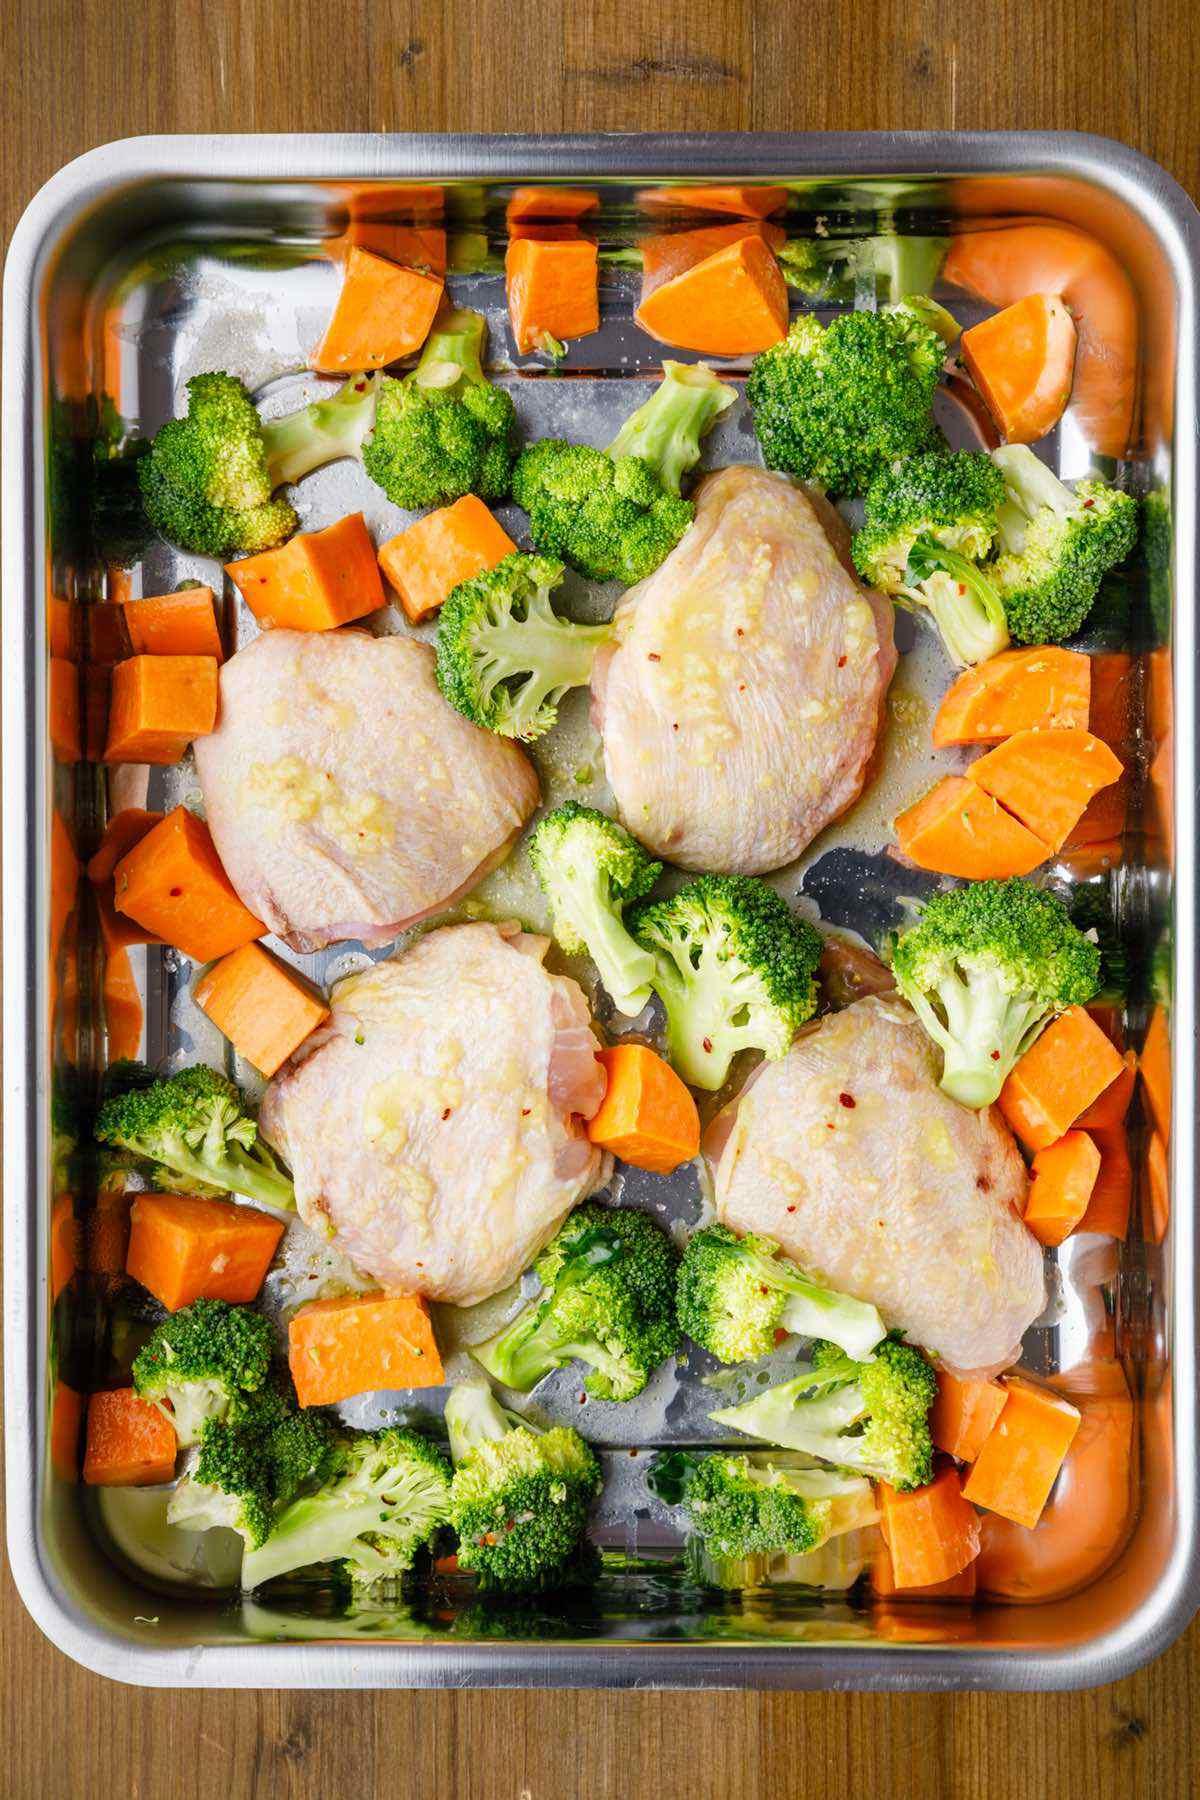 prepping raw chicken thigh broccoli sweet potato